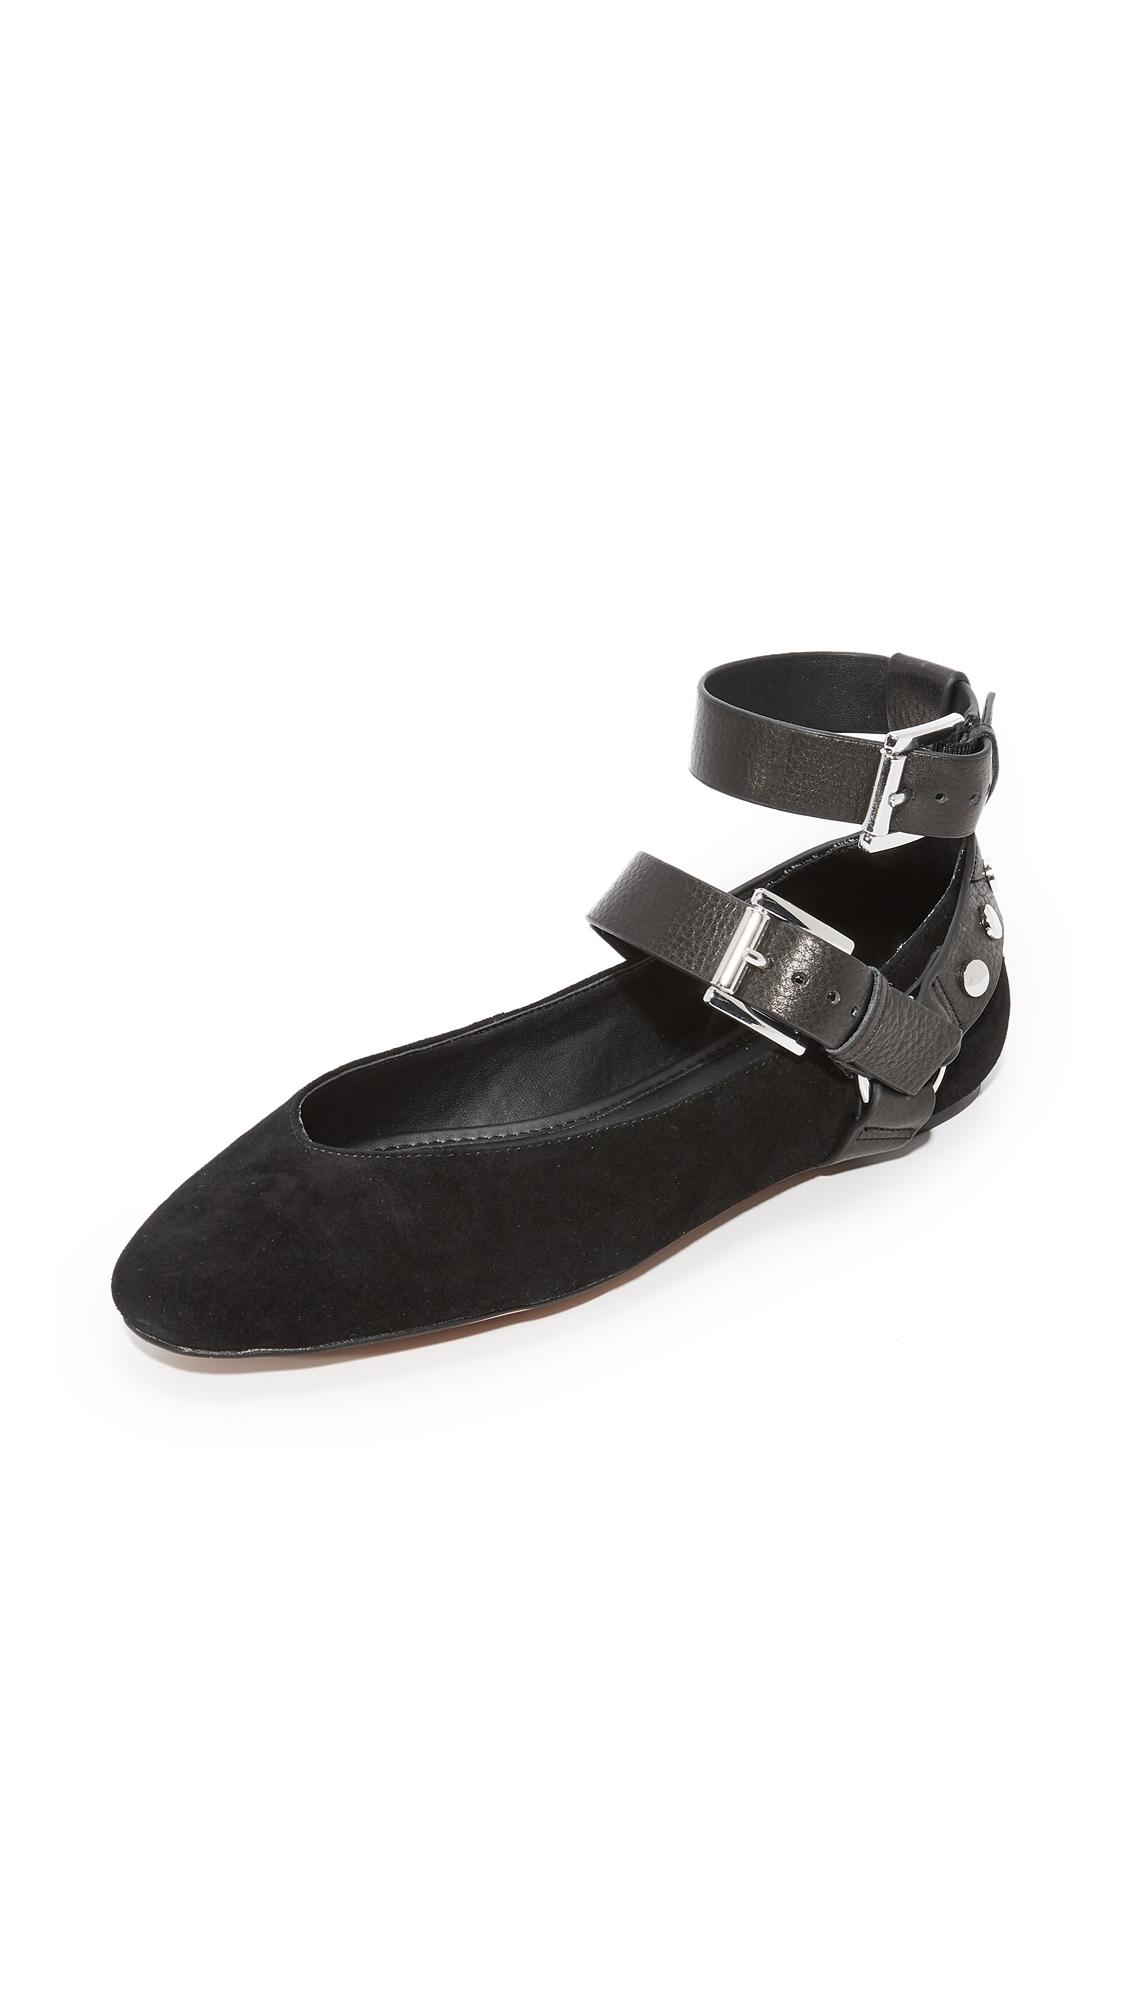 Rebecca Minkoff Vivica Harness Ballet Flats - Black